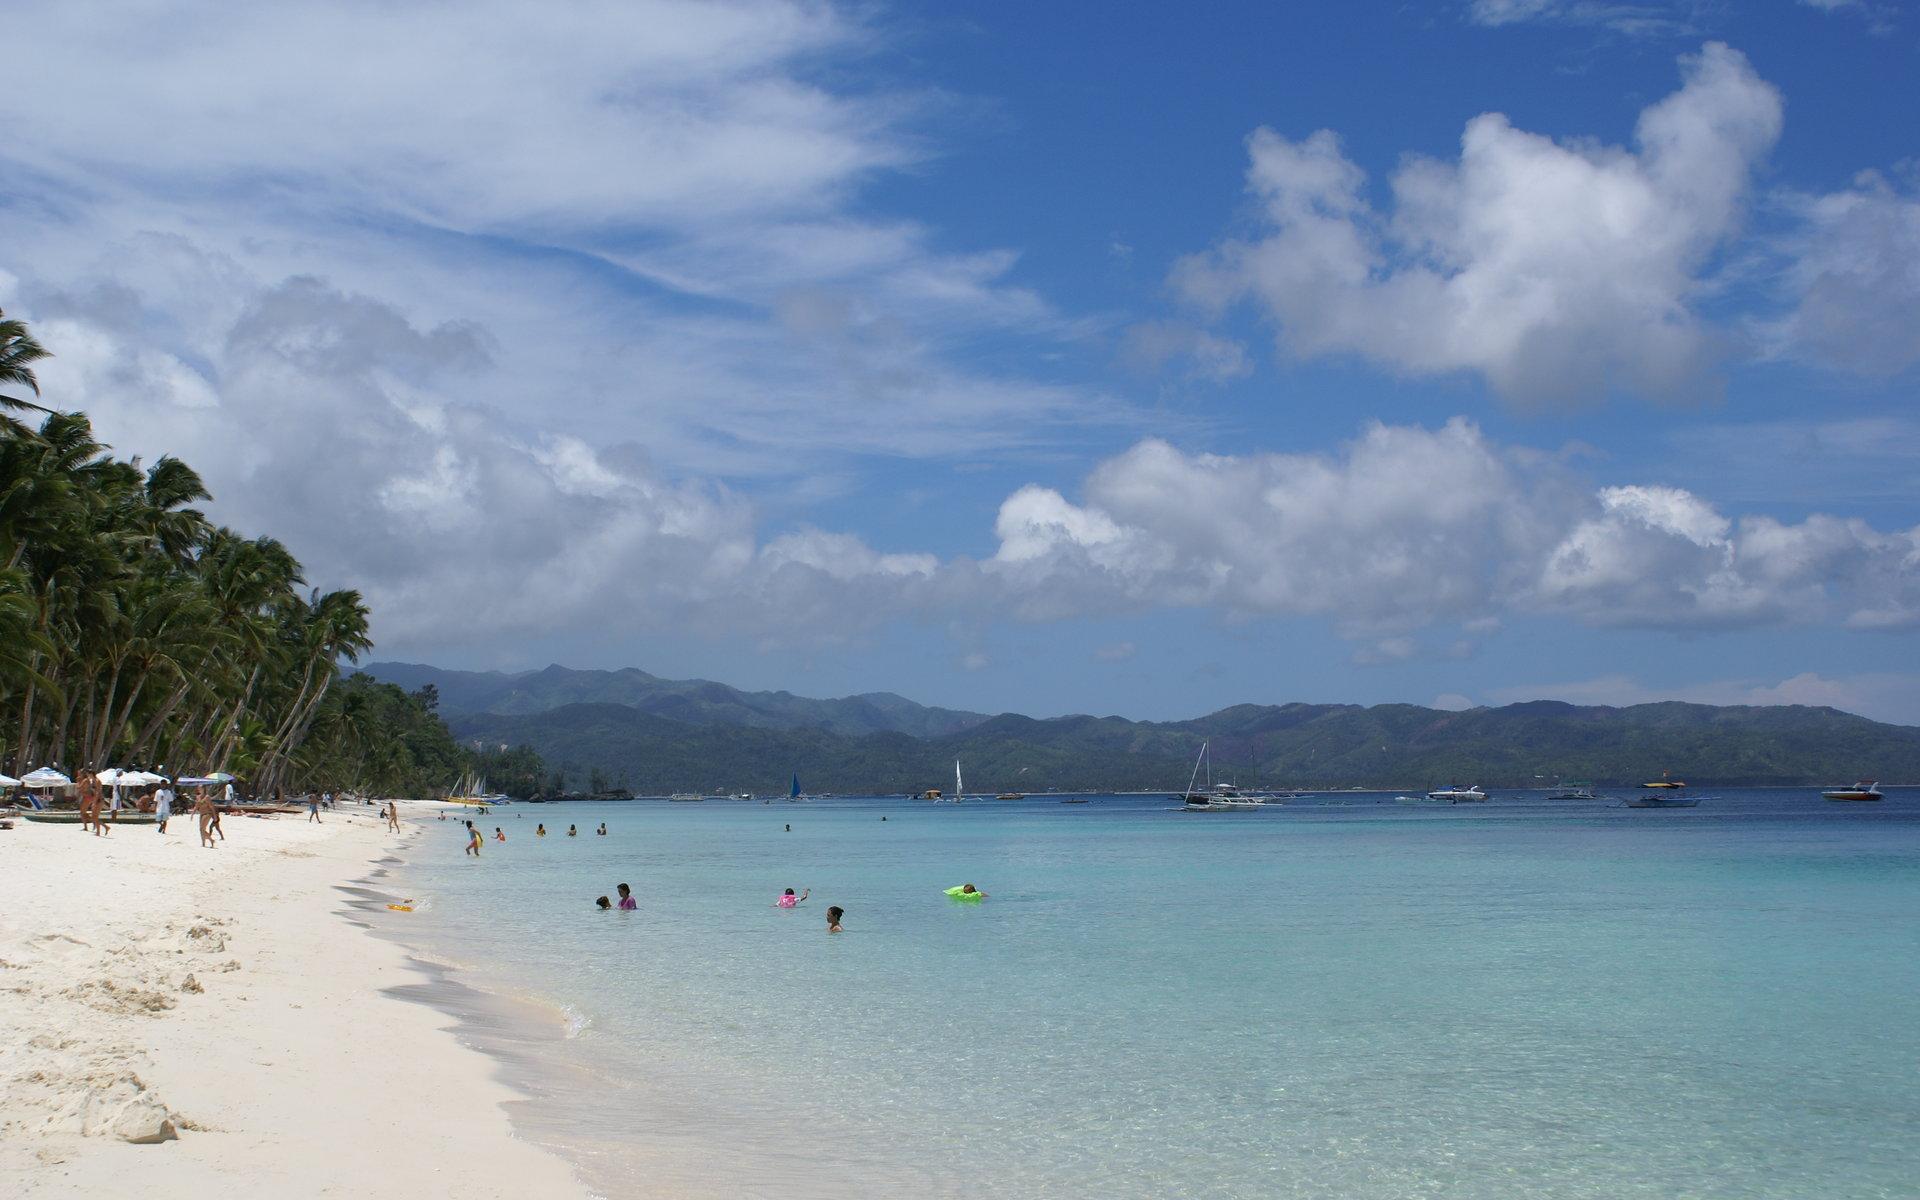 boracay beach hq wide - photo #27